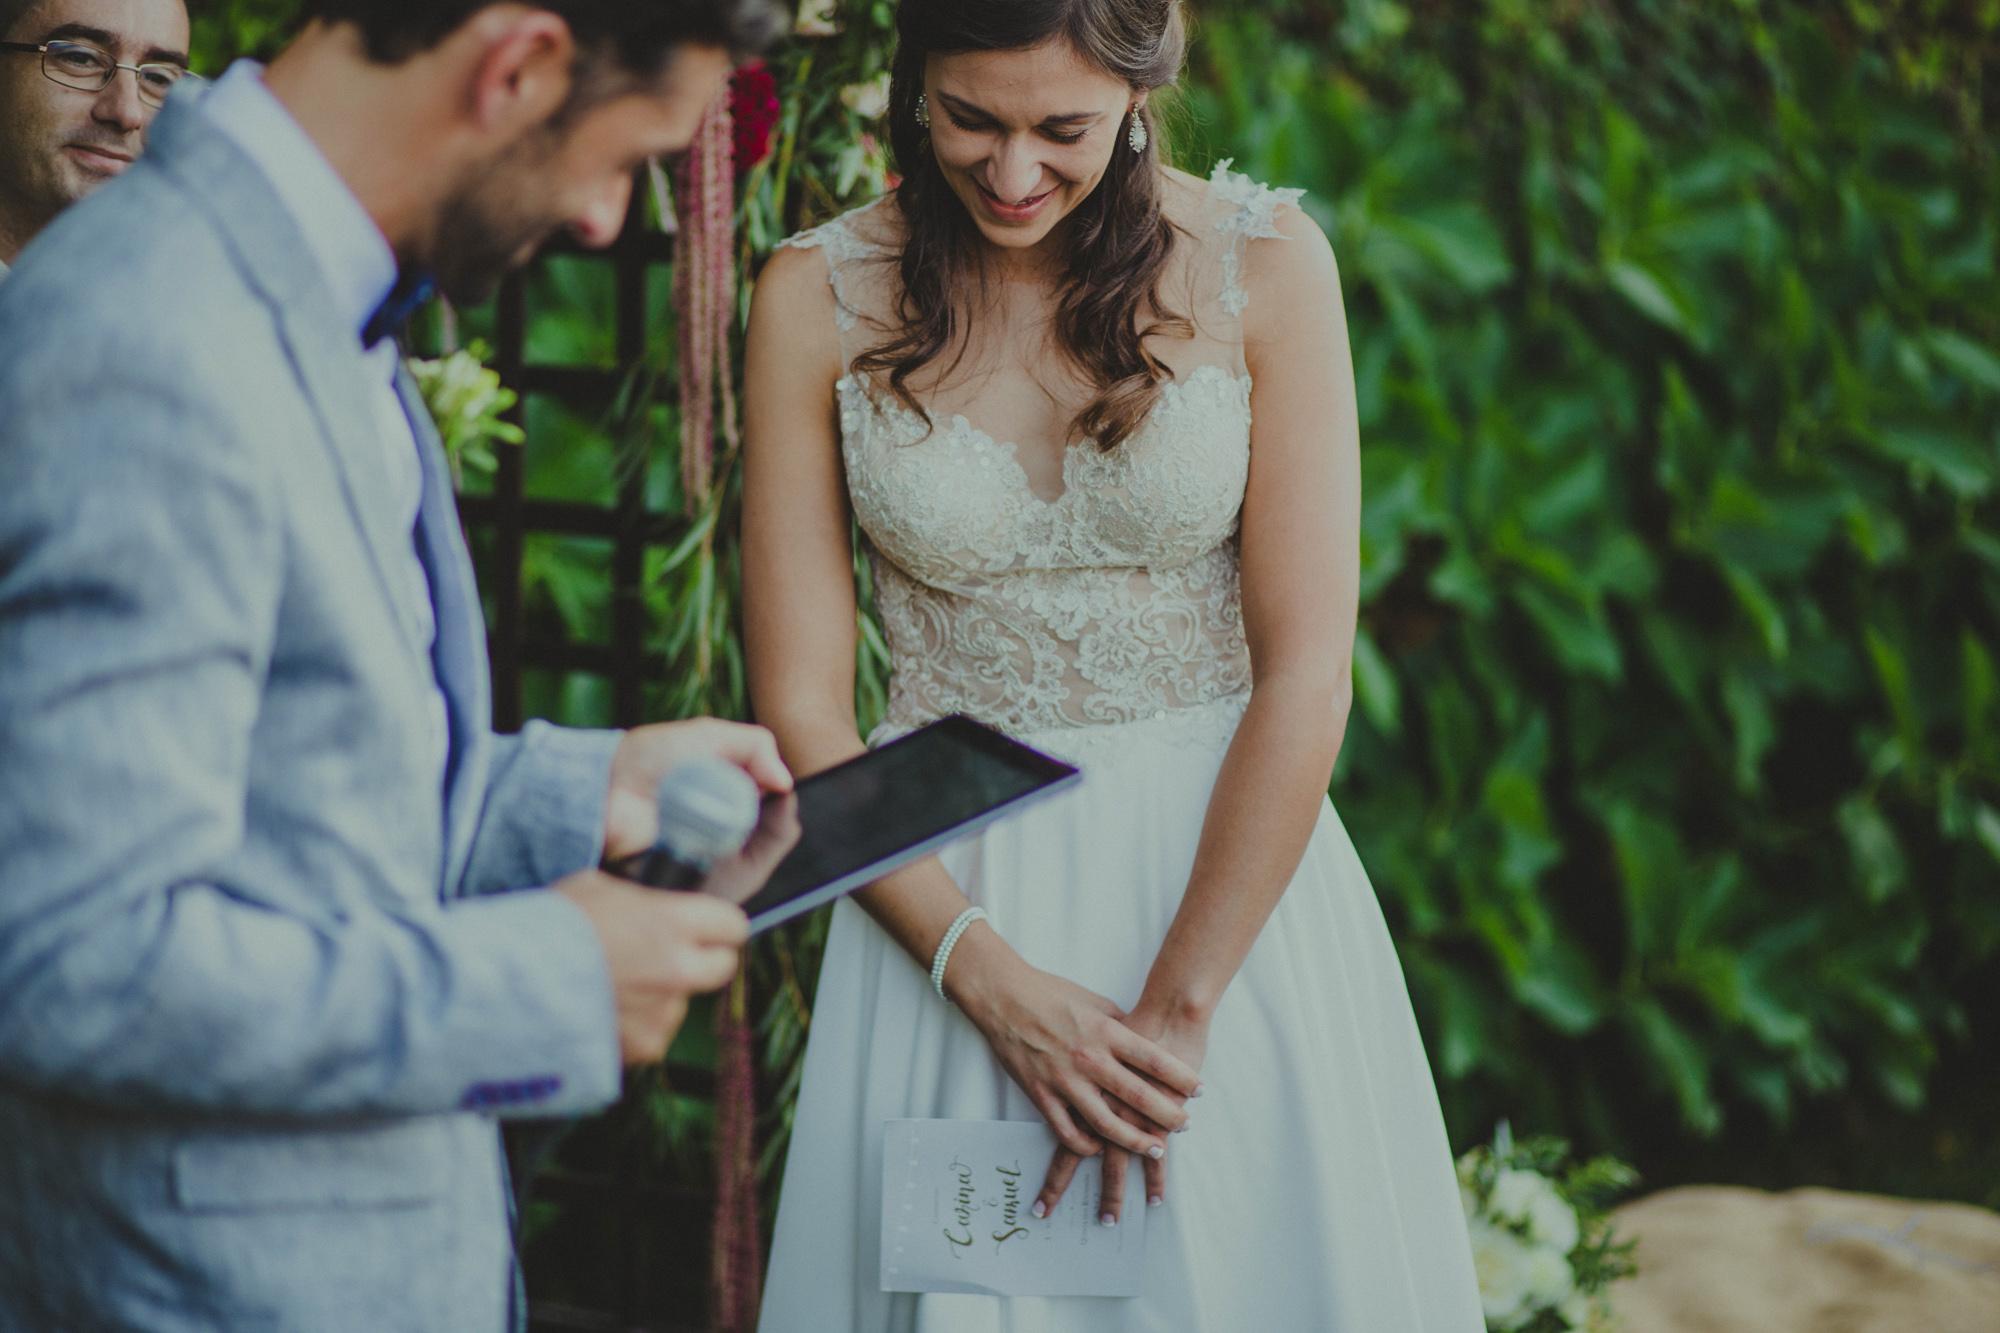 051-carina-e-samuel-wedding-casamento-quinta-dos-rouxinois-rustico-my-fancy-wedding-mafra-malveira-lisboa-sintra-cascais-filipe-santiago-fotografia-fotografo-lifestyle-destination-portugal